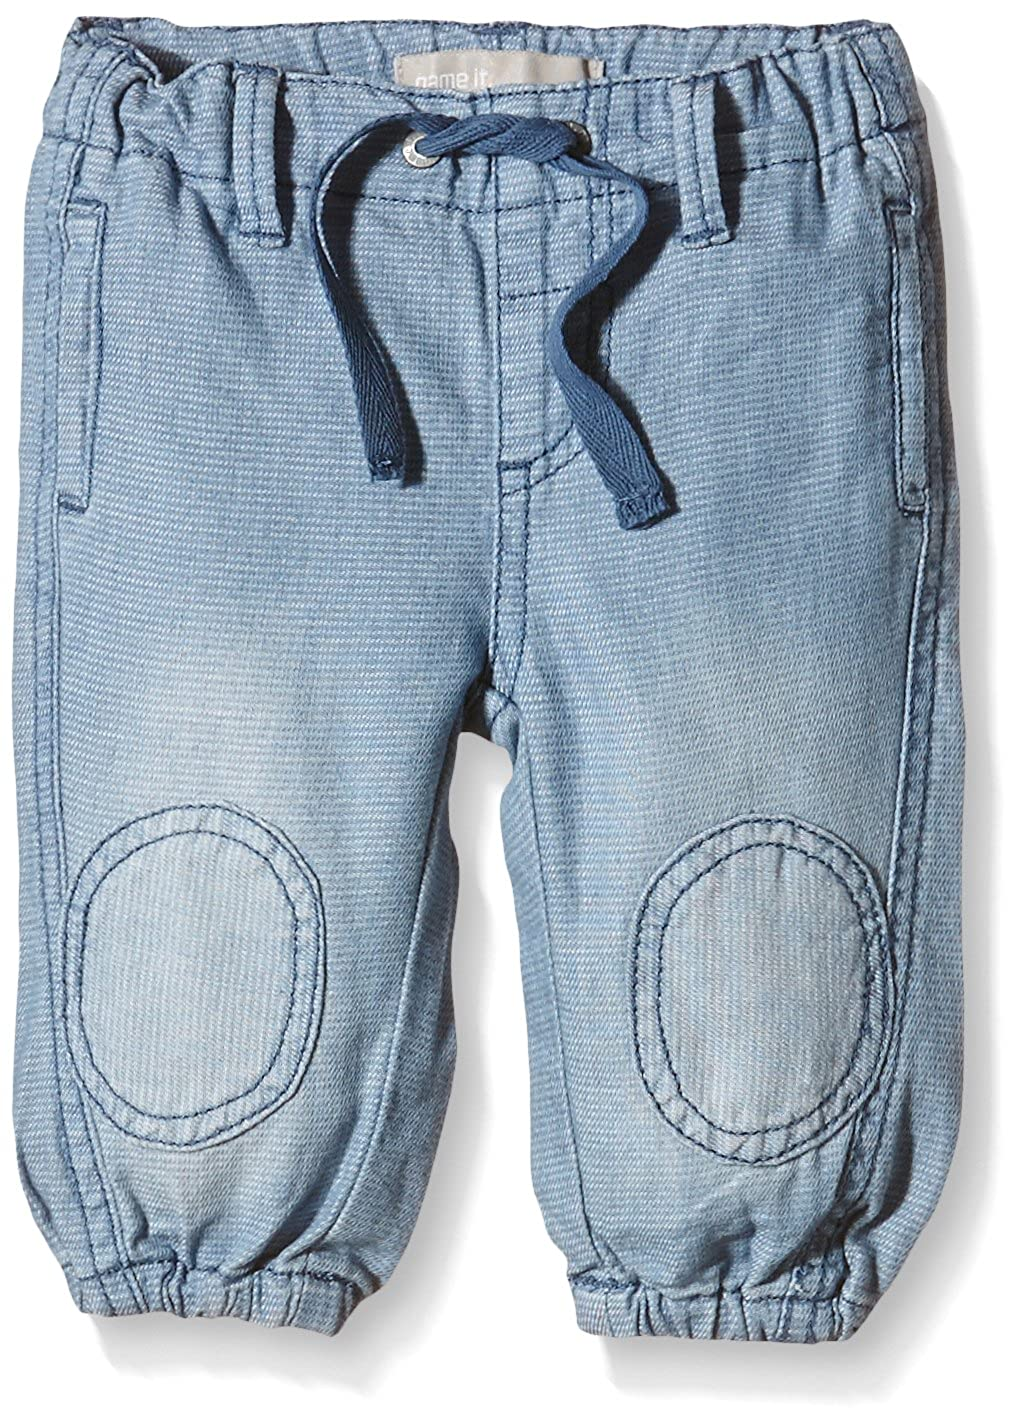 NAME IT Baby-Jungen Jeanshose Blau (Medium Blue Denim) 56 13131552